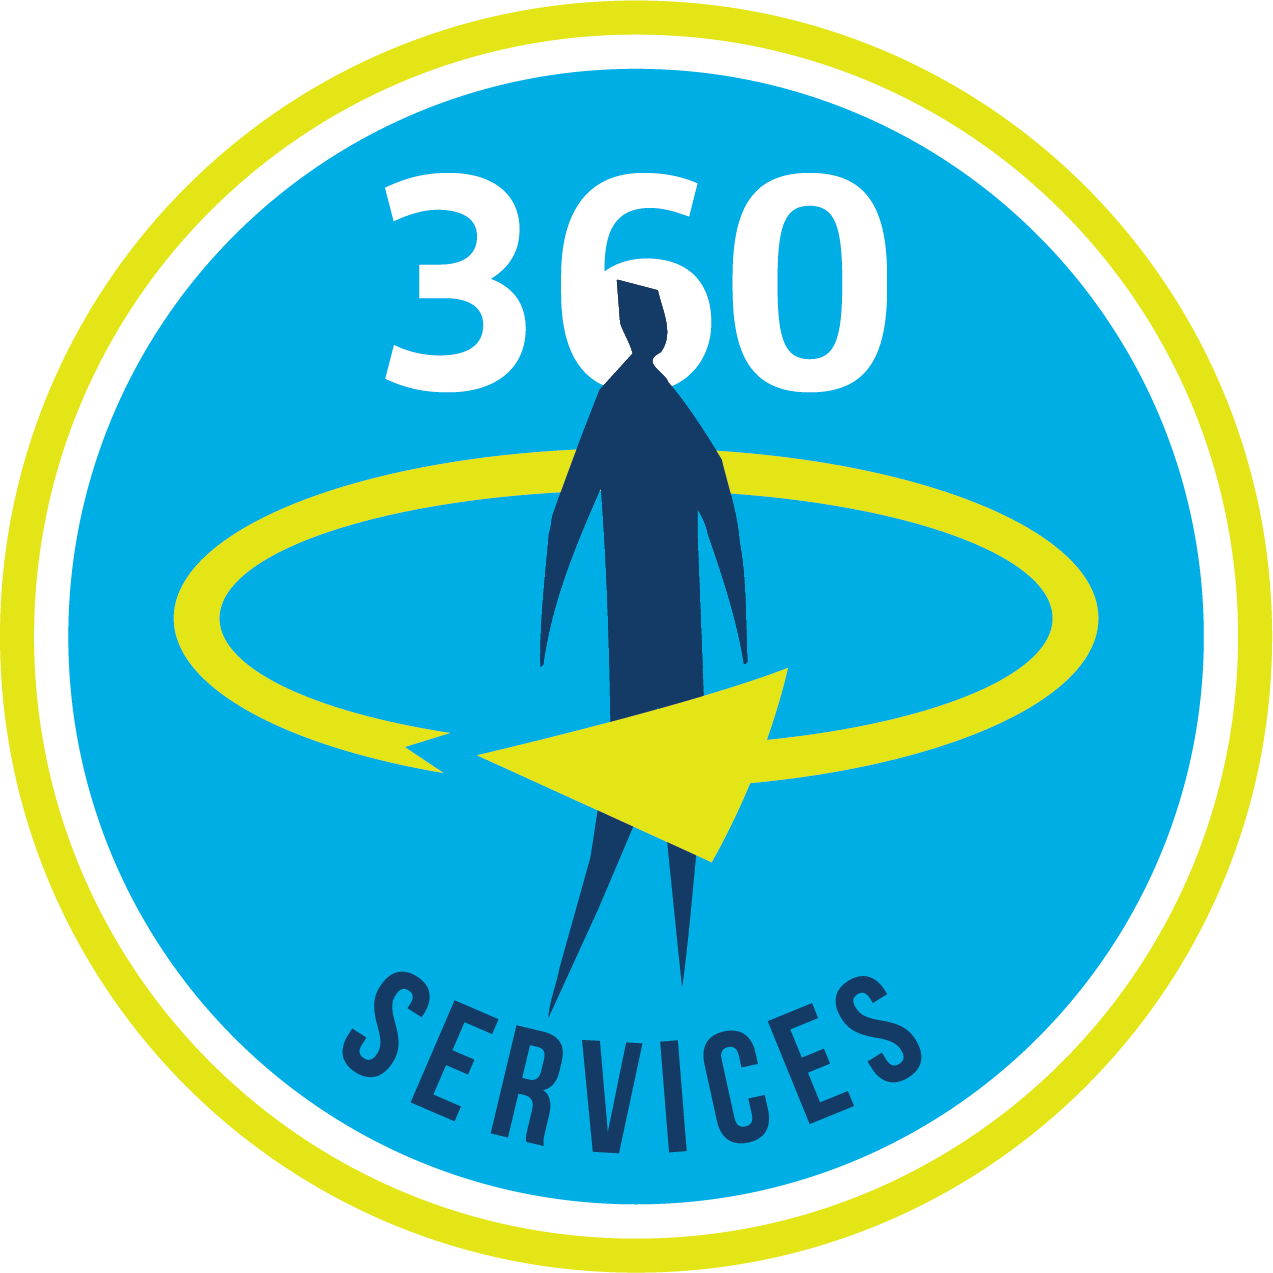 aclvb-universele_diensten-logo-cmyk_ok_fr.png